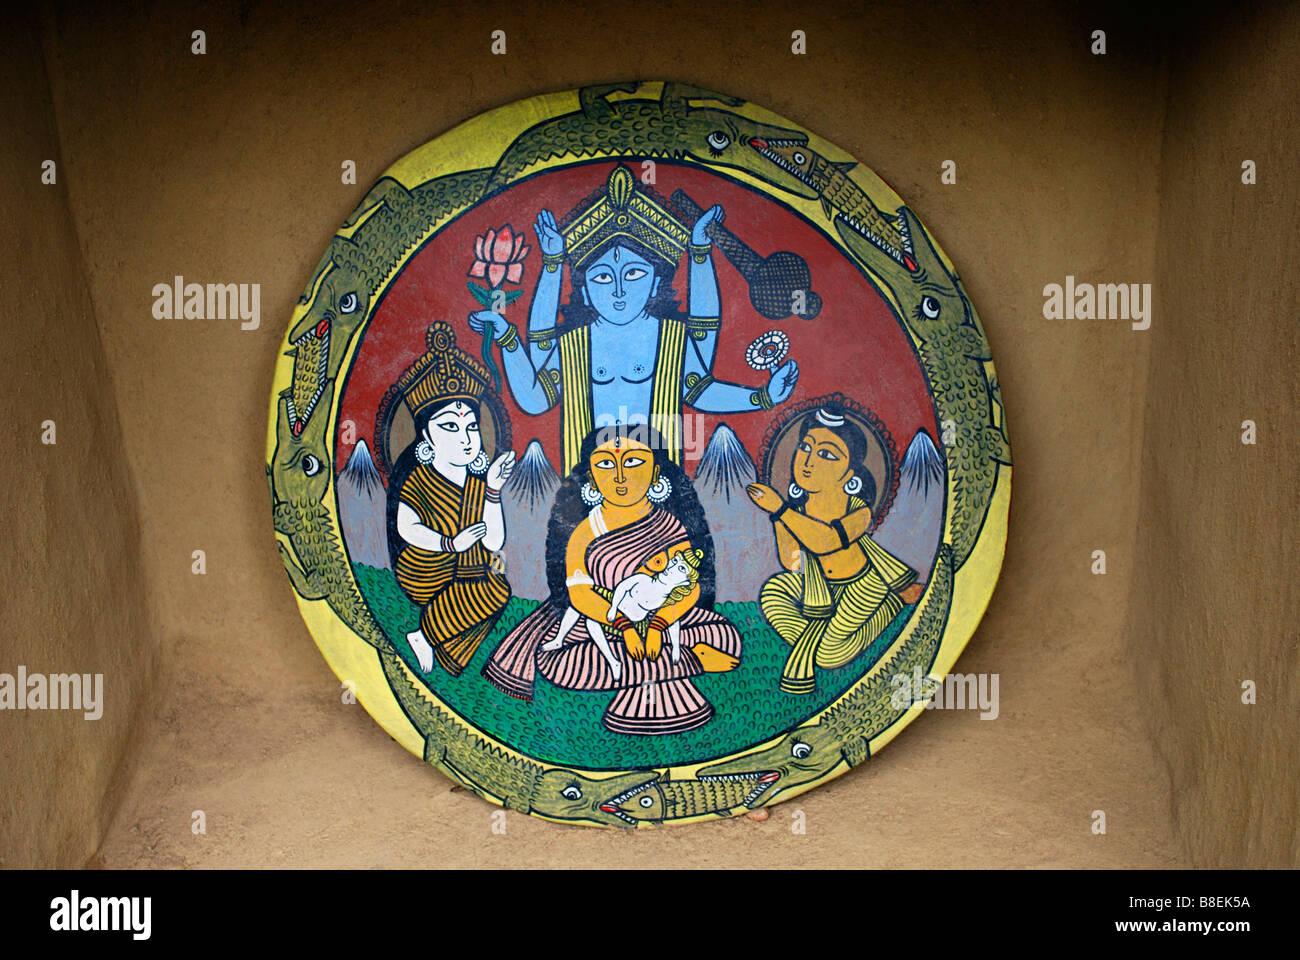 The Myth of the Ganga-Durga Clash, Manav Sangrahalaya, Bhopal, Madhya Pradesh, India. - Stock Image